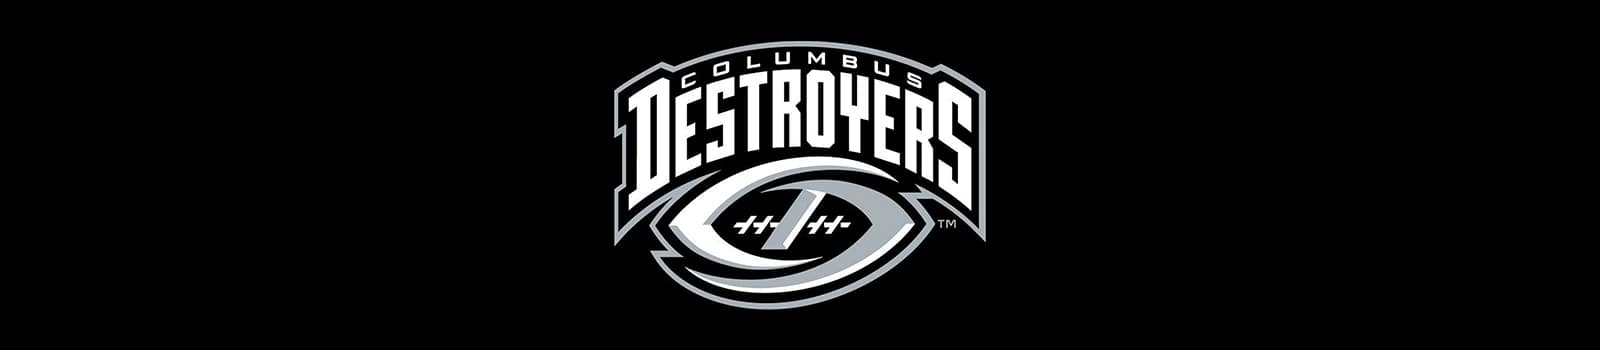 Columbus Destroyers Logo